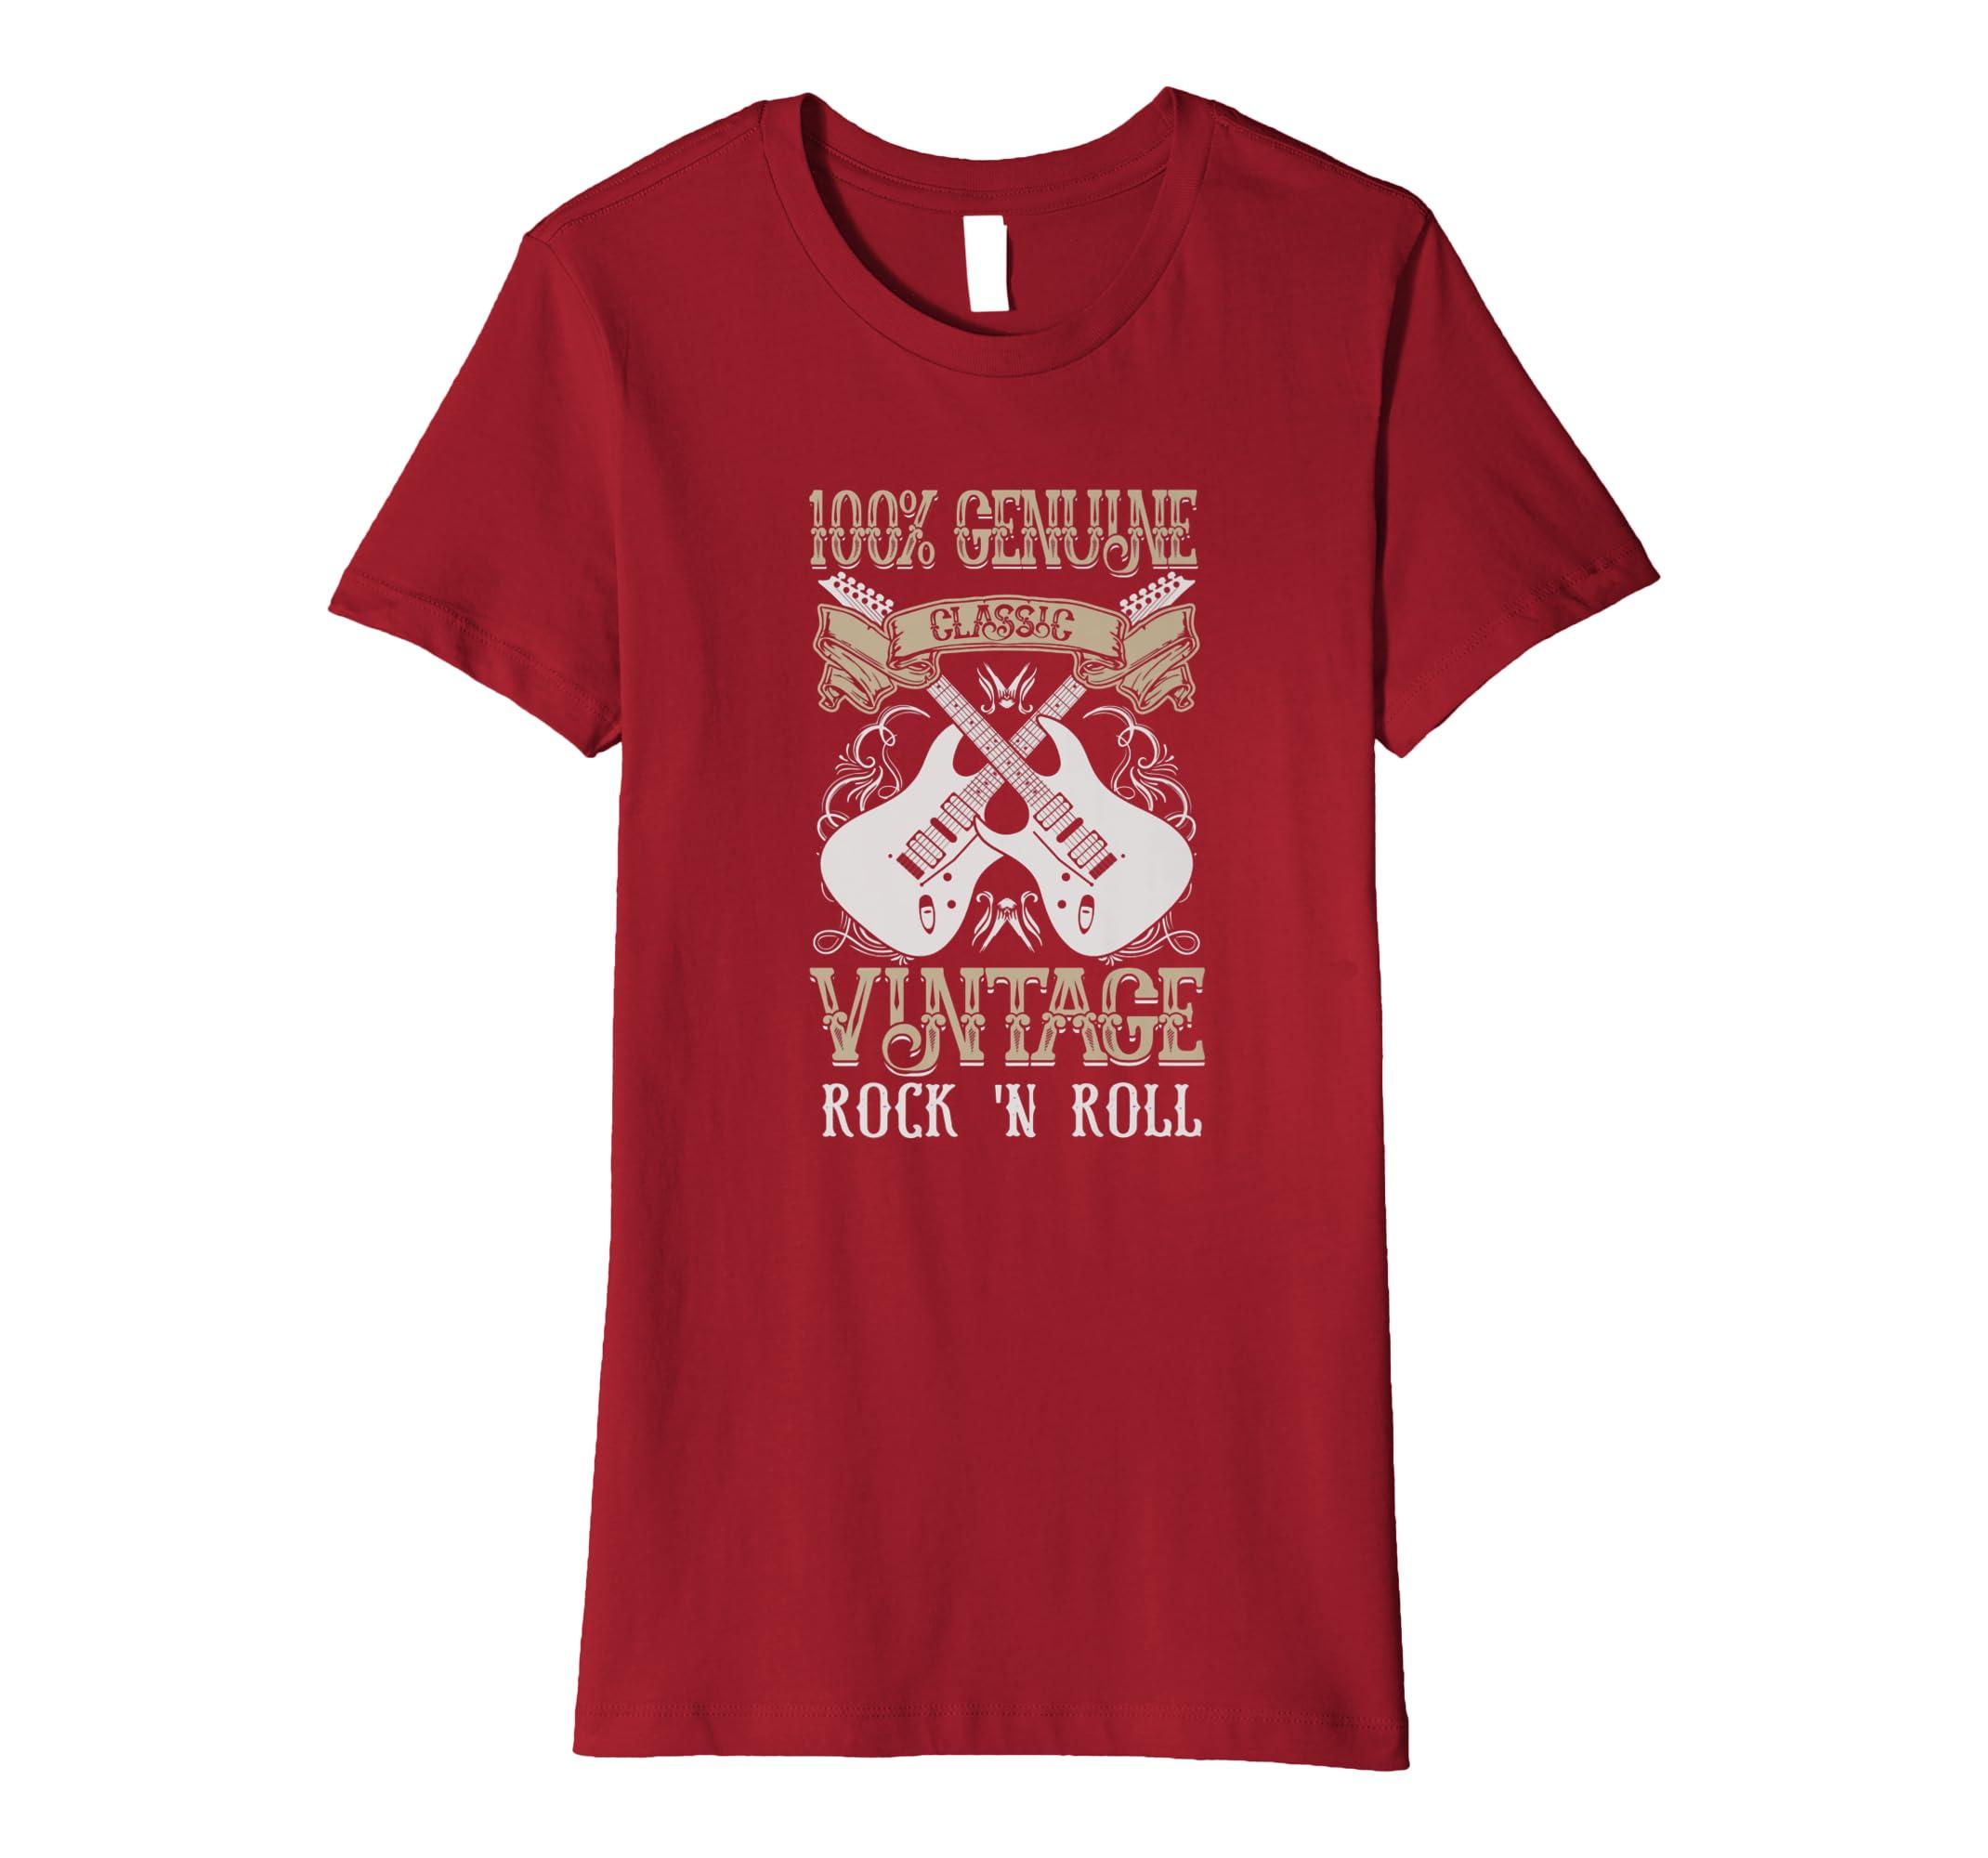 d160830d Amazon.com: Classic Vintage Rock and Roll Guitars T Shirt Guitar Music:  Clothing